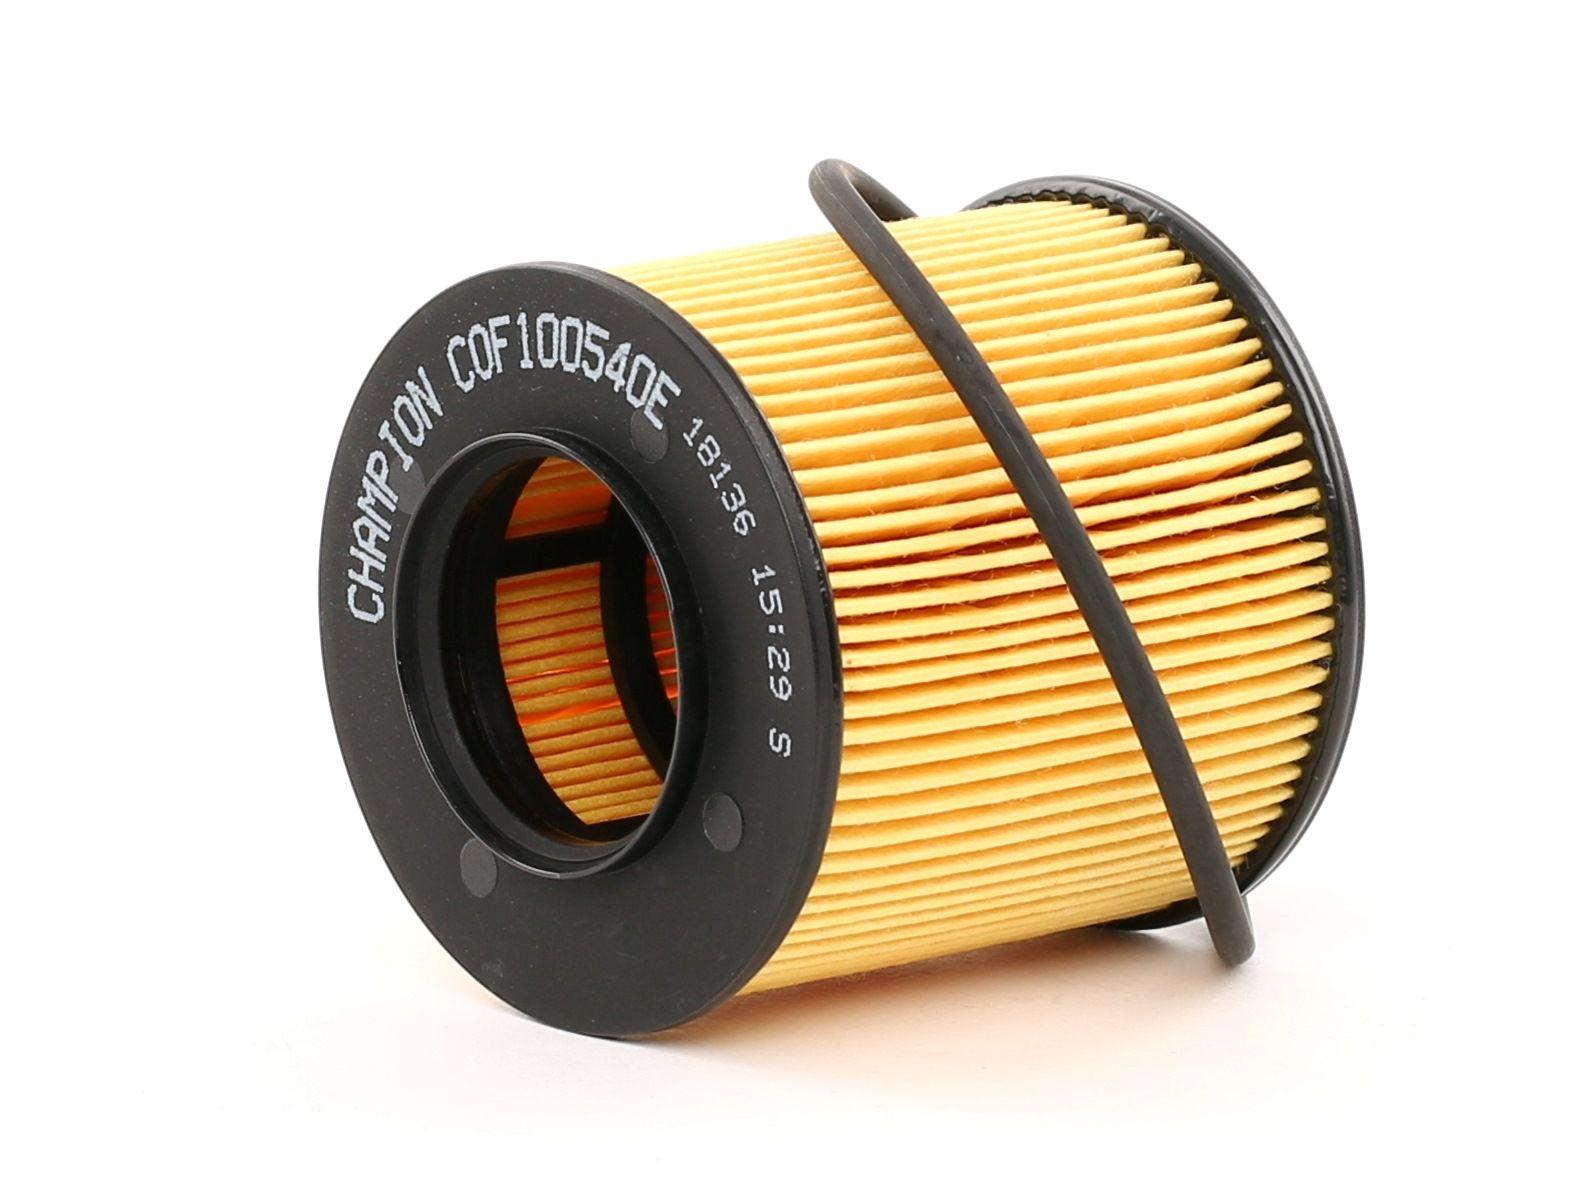 COF100540E CHAMPION EON TITAN Filtereinsatz Innendurchmesser: 33mm, Innendurchmesser 2: 38mm, Innendurchmesser 2: 28mm, Ø: 65mm, Höhe: 72mm Ölfilter COF100540E günstig kaufen